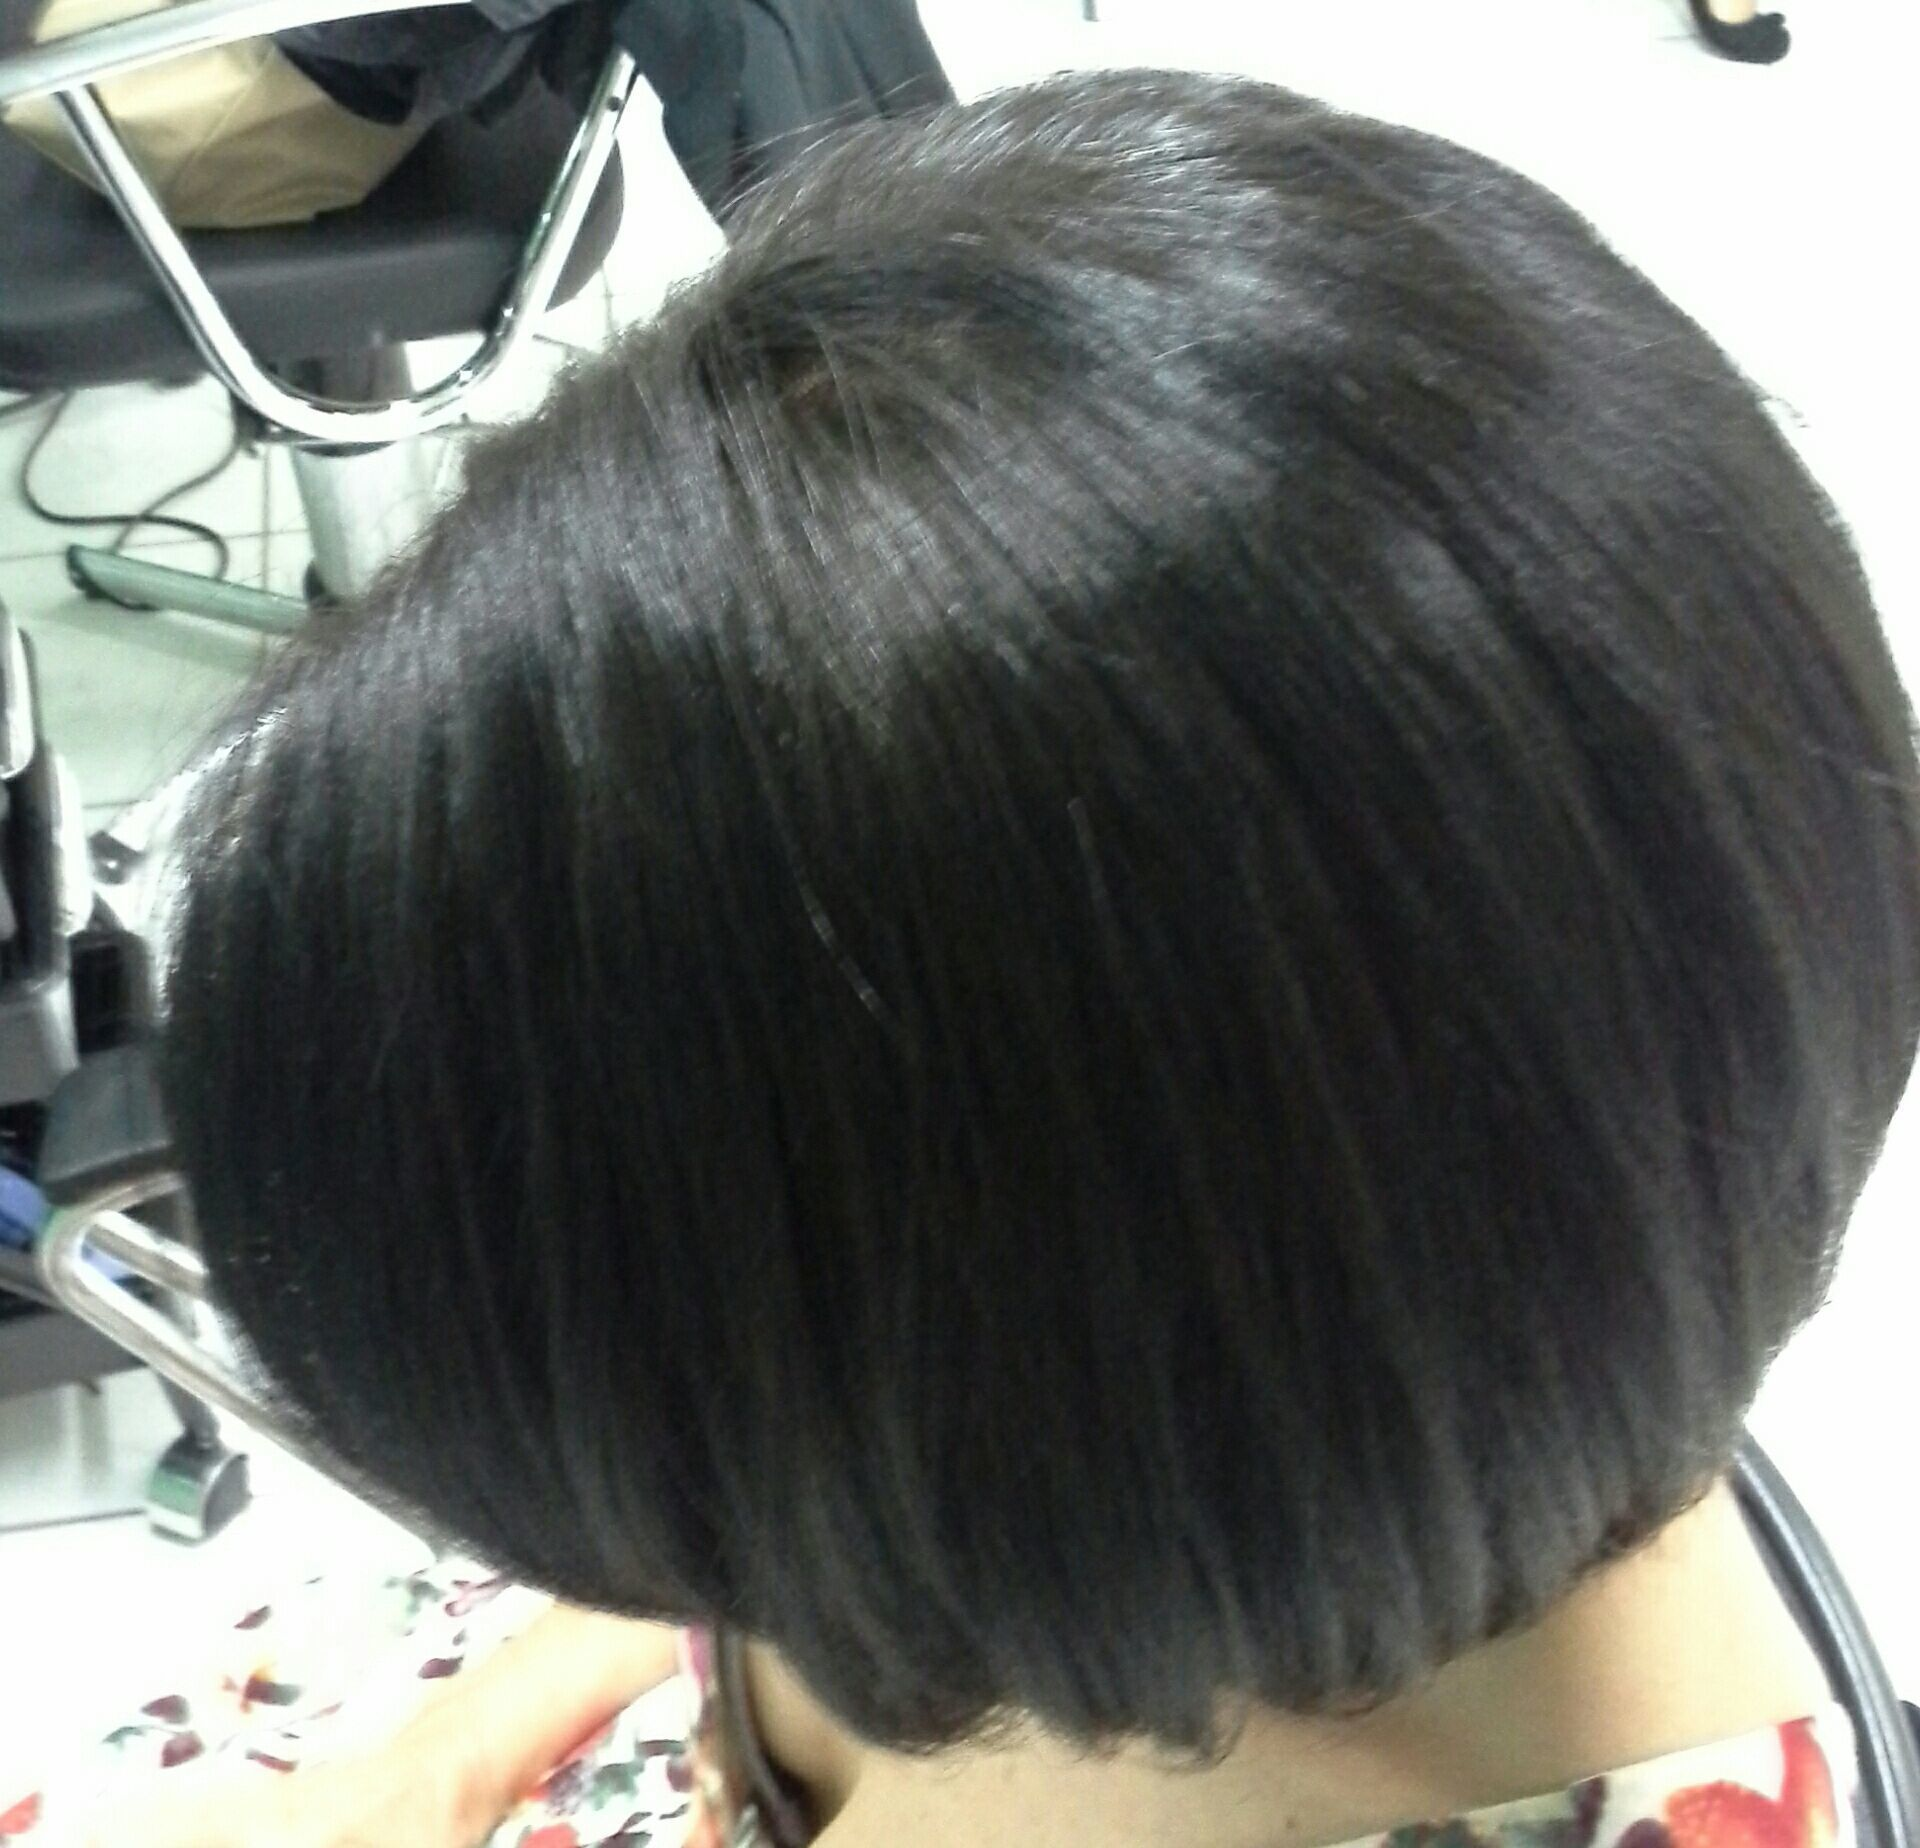 Corte chanel cabelo stylist / visagista cabeleireiro(a)